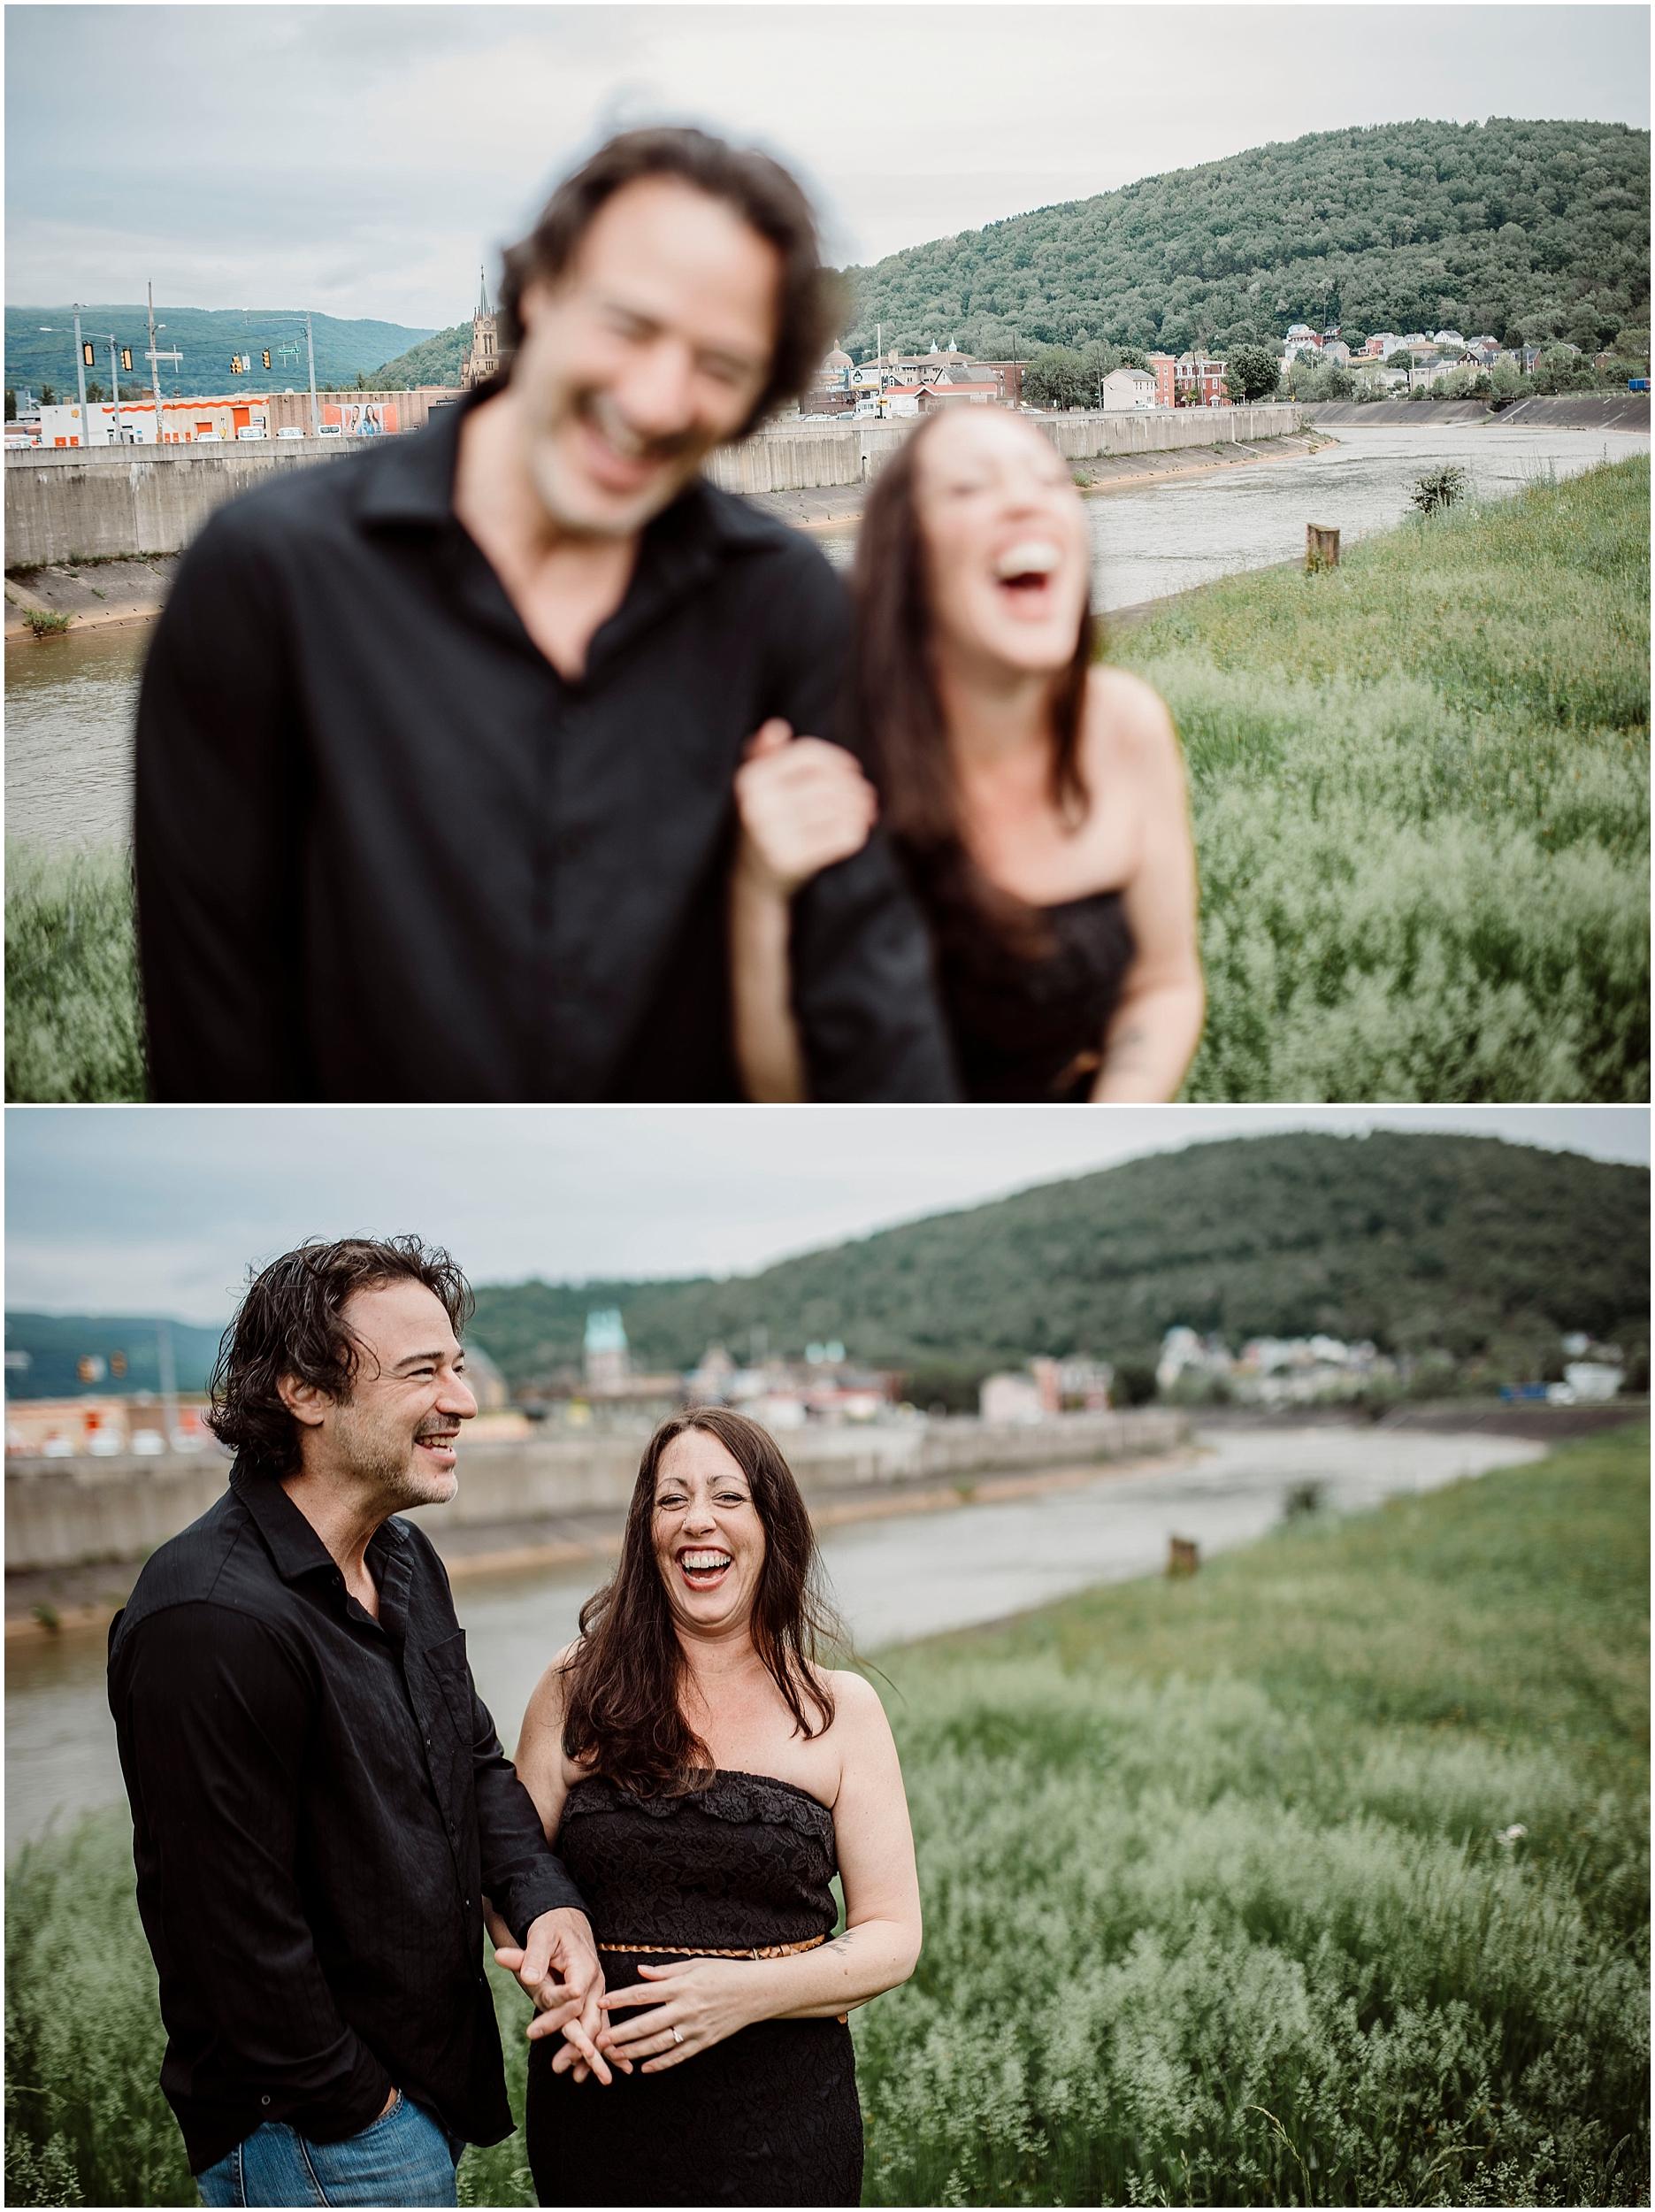 Pittsburgh-wedding-photographer-sandrachile_0005.jpg